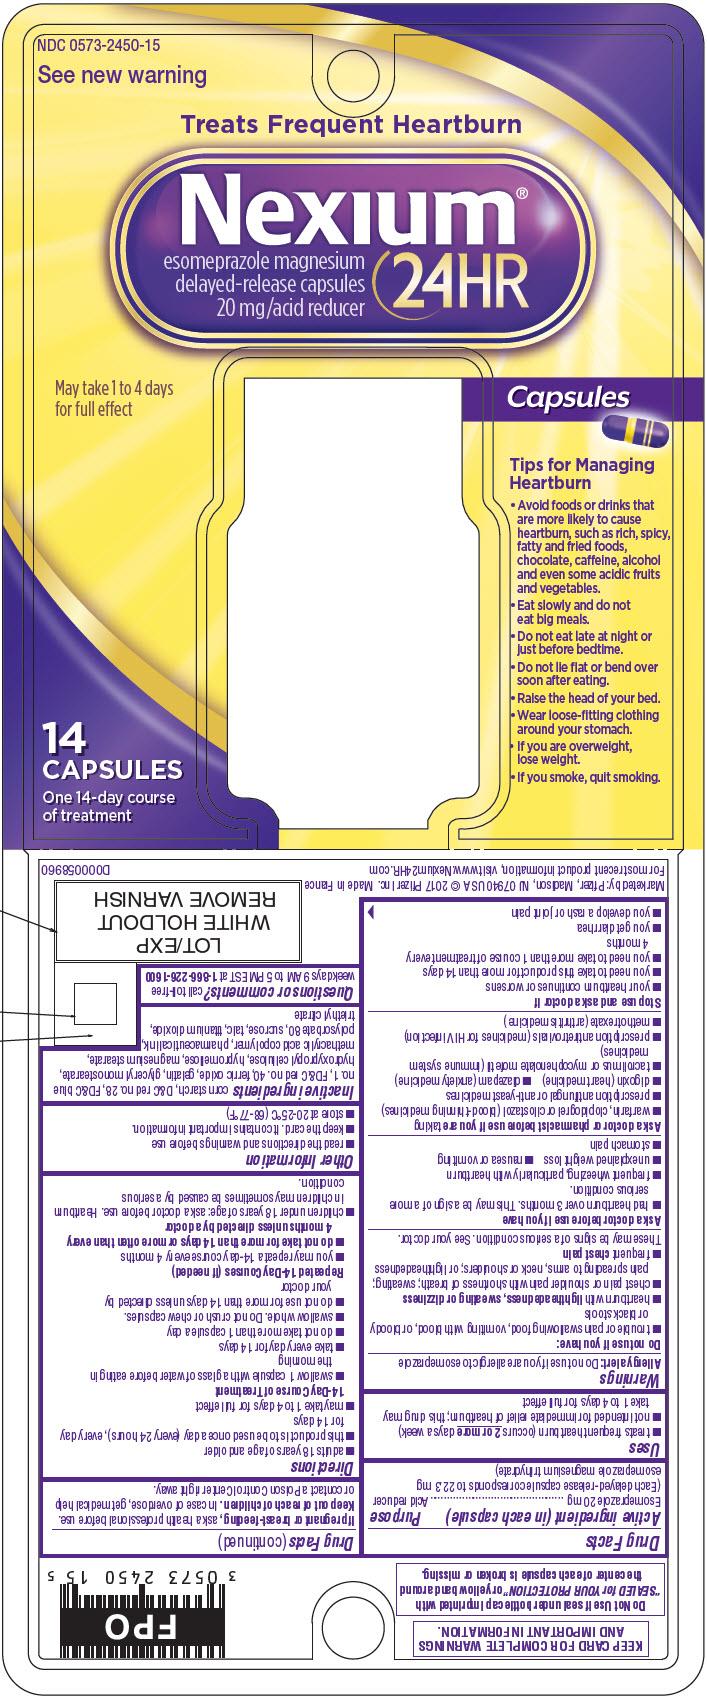 PRINCIPAL DISPLAY PANEL - 14 Capsule Bottle Blister Pack